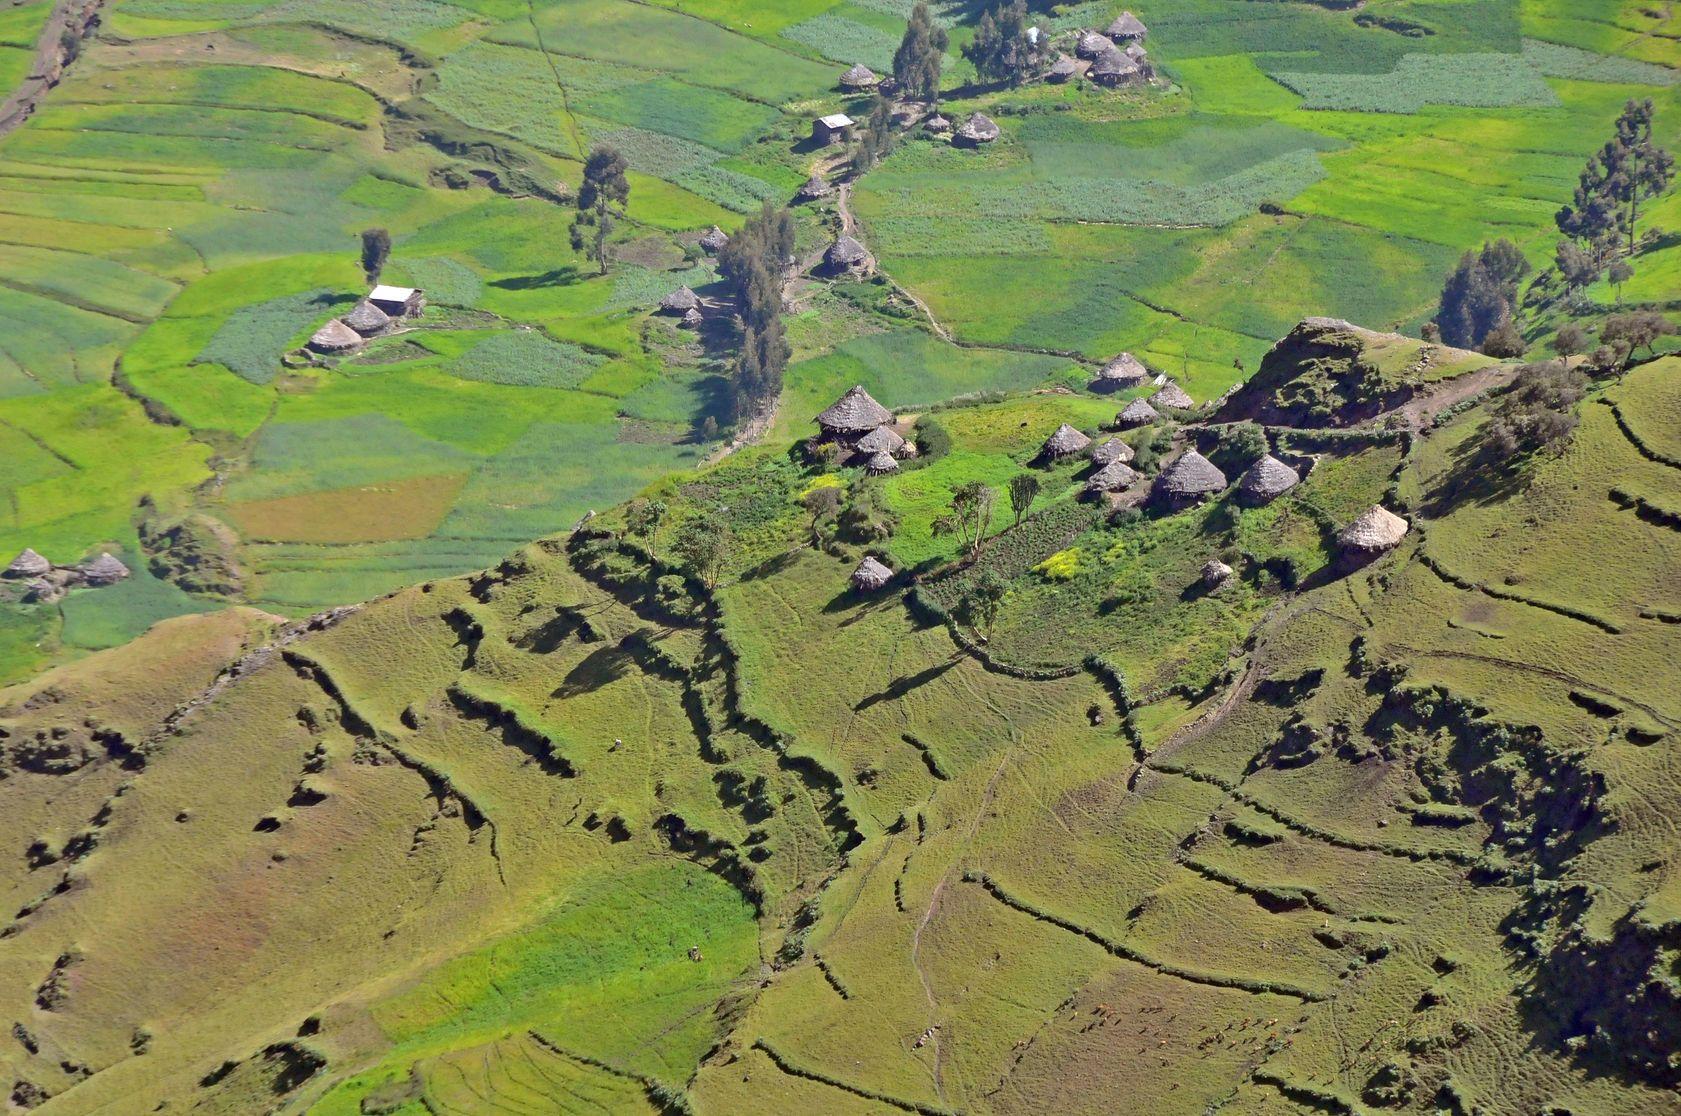 Národní park Simienské hory v Etiopii | bluerain22/123RF.com